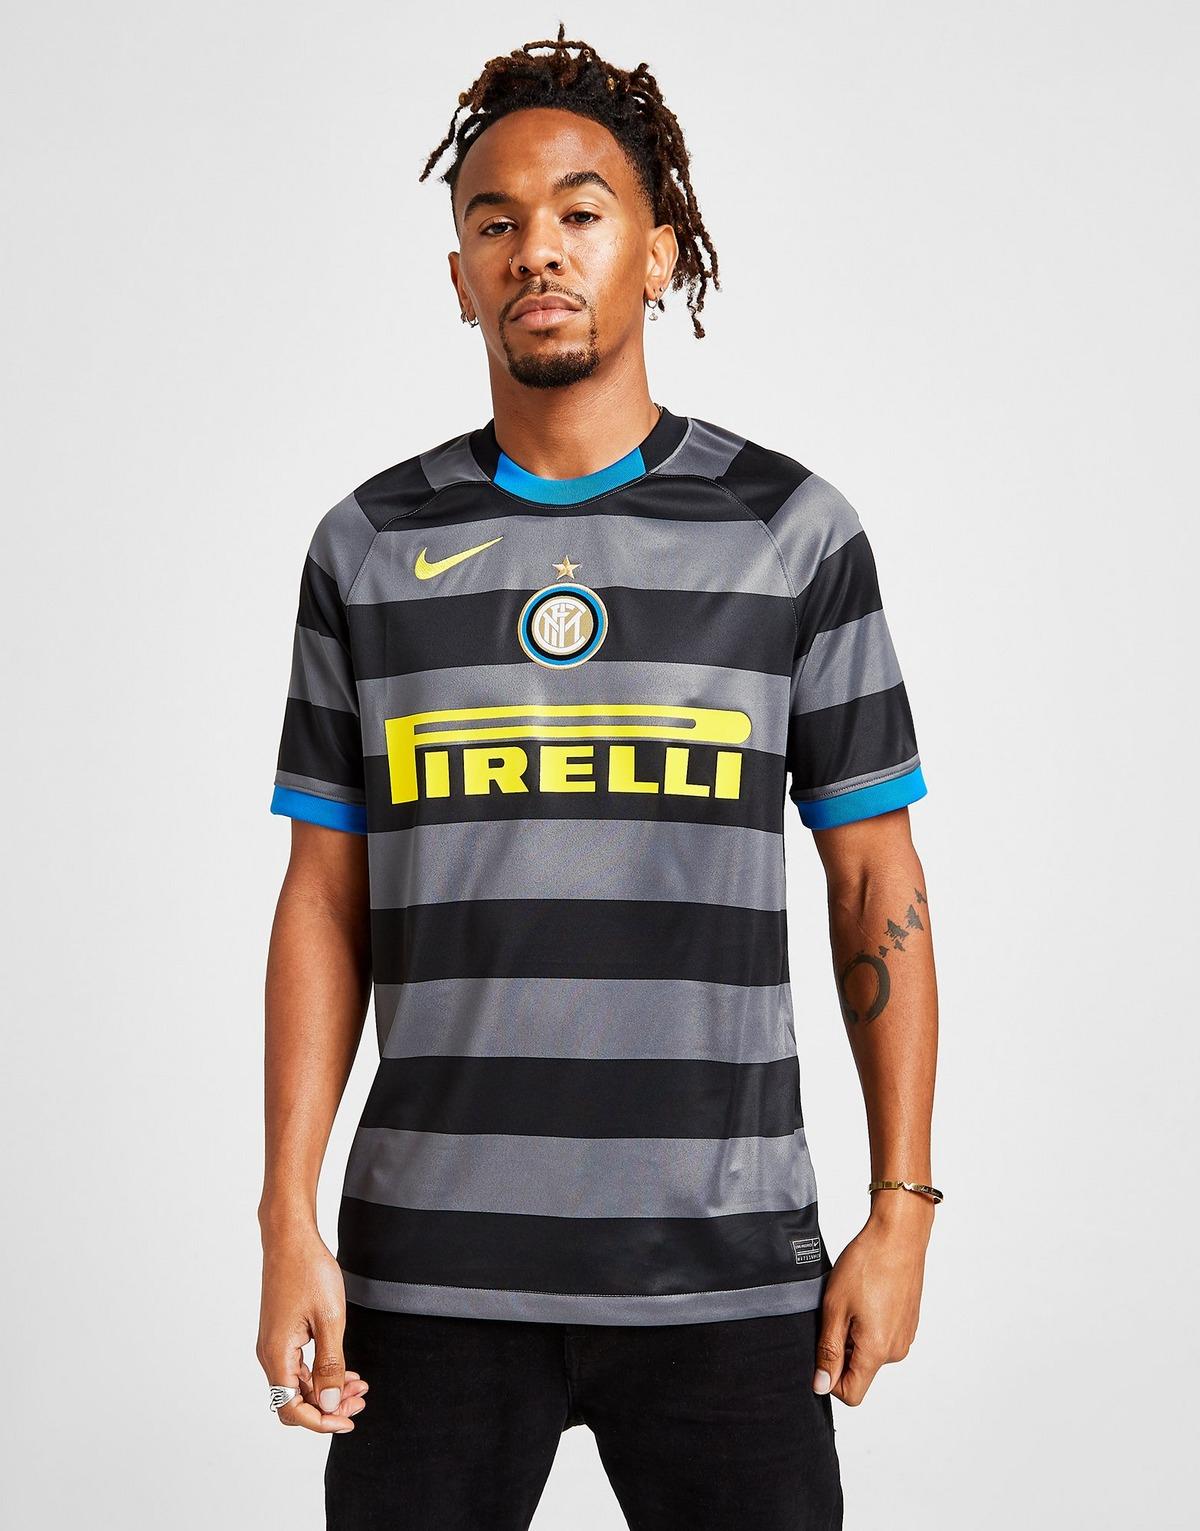 Maillot de Football Nike Inter Milan Third - 2020/2021